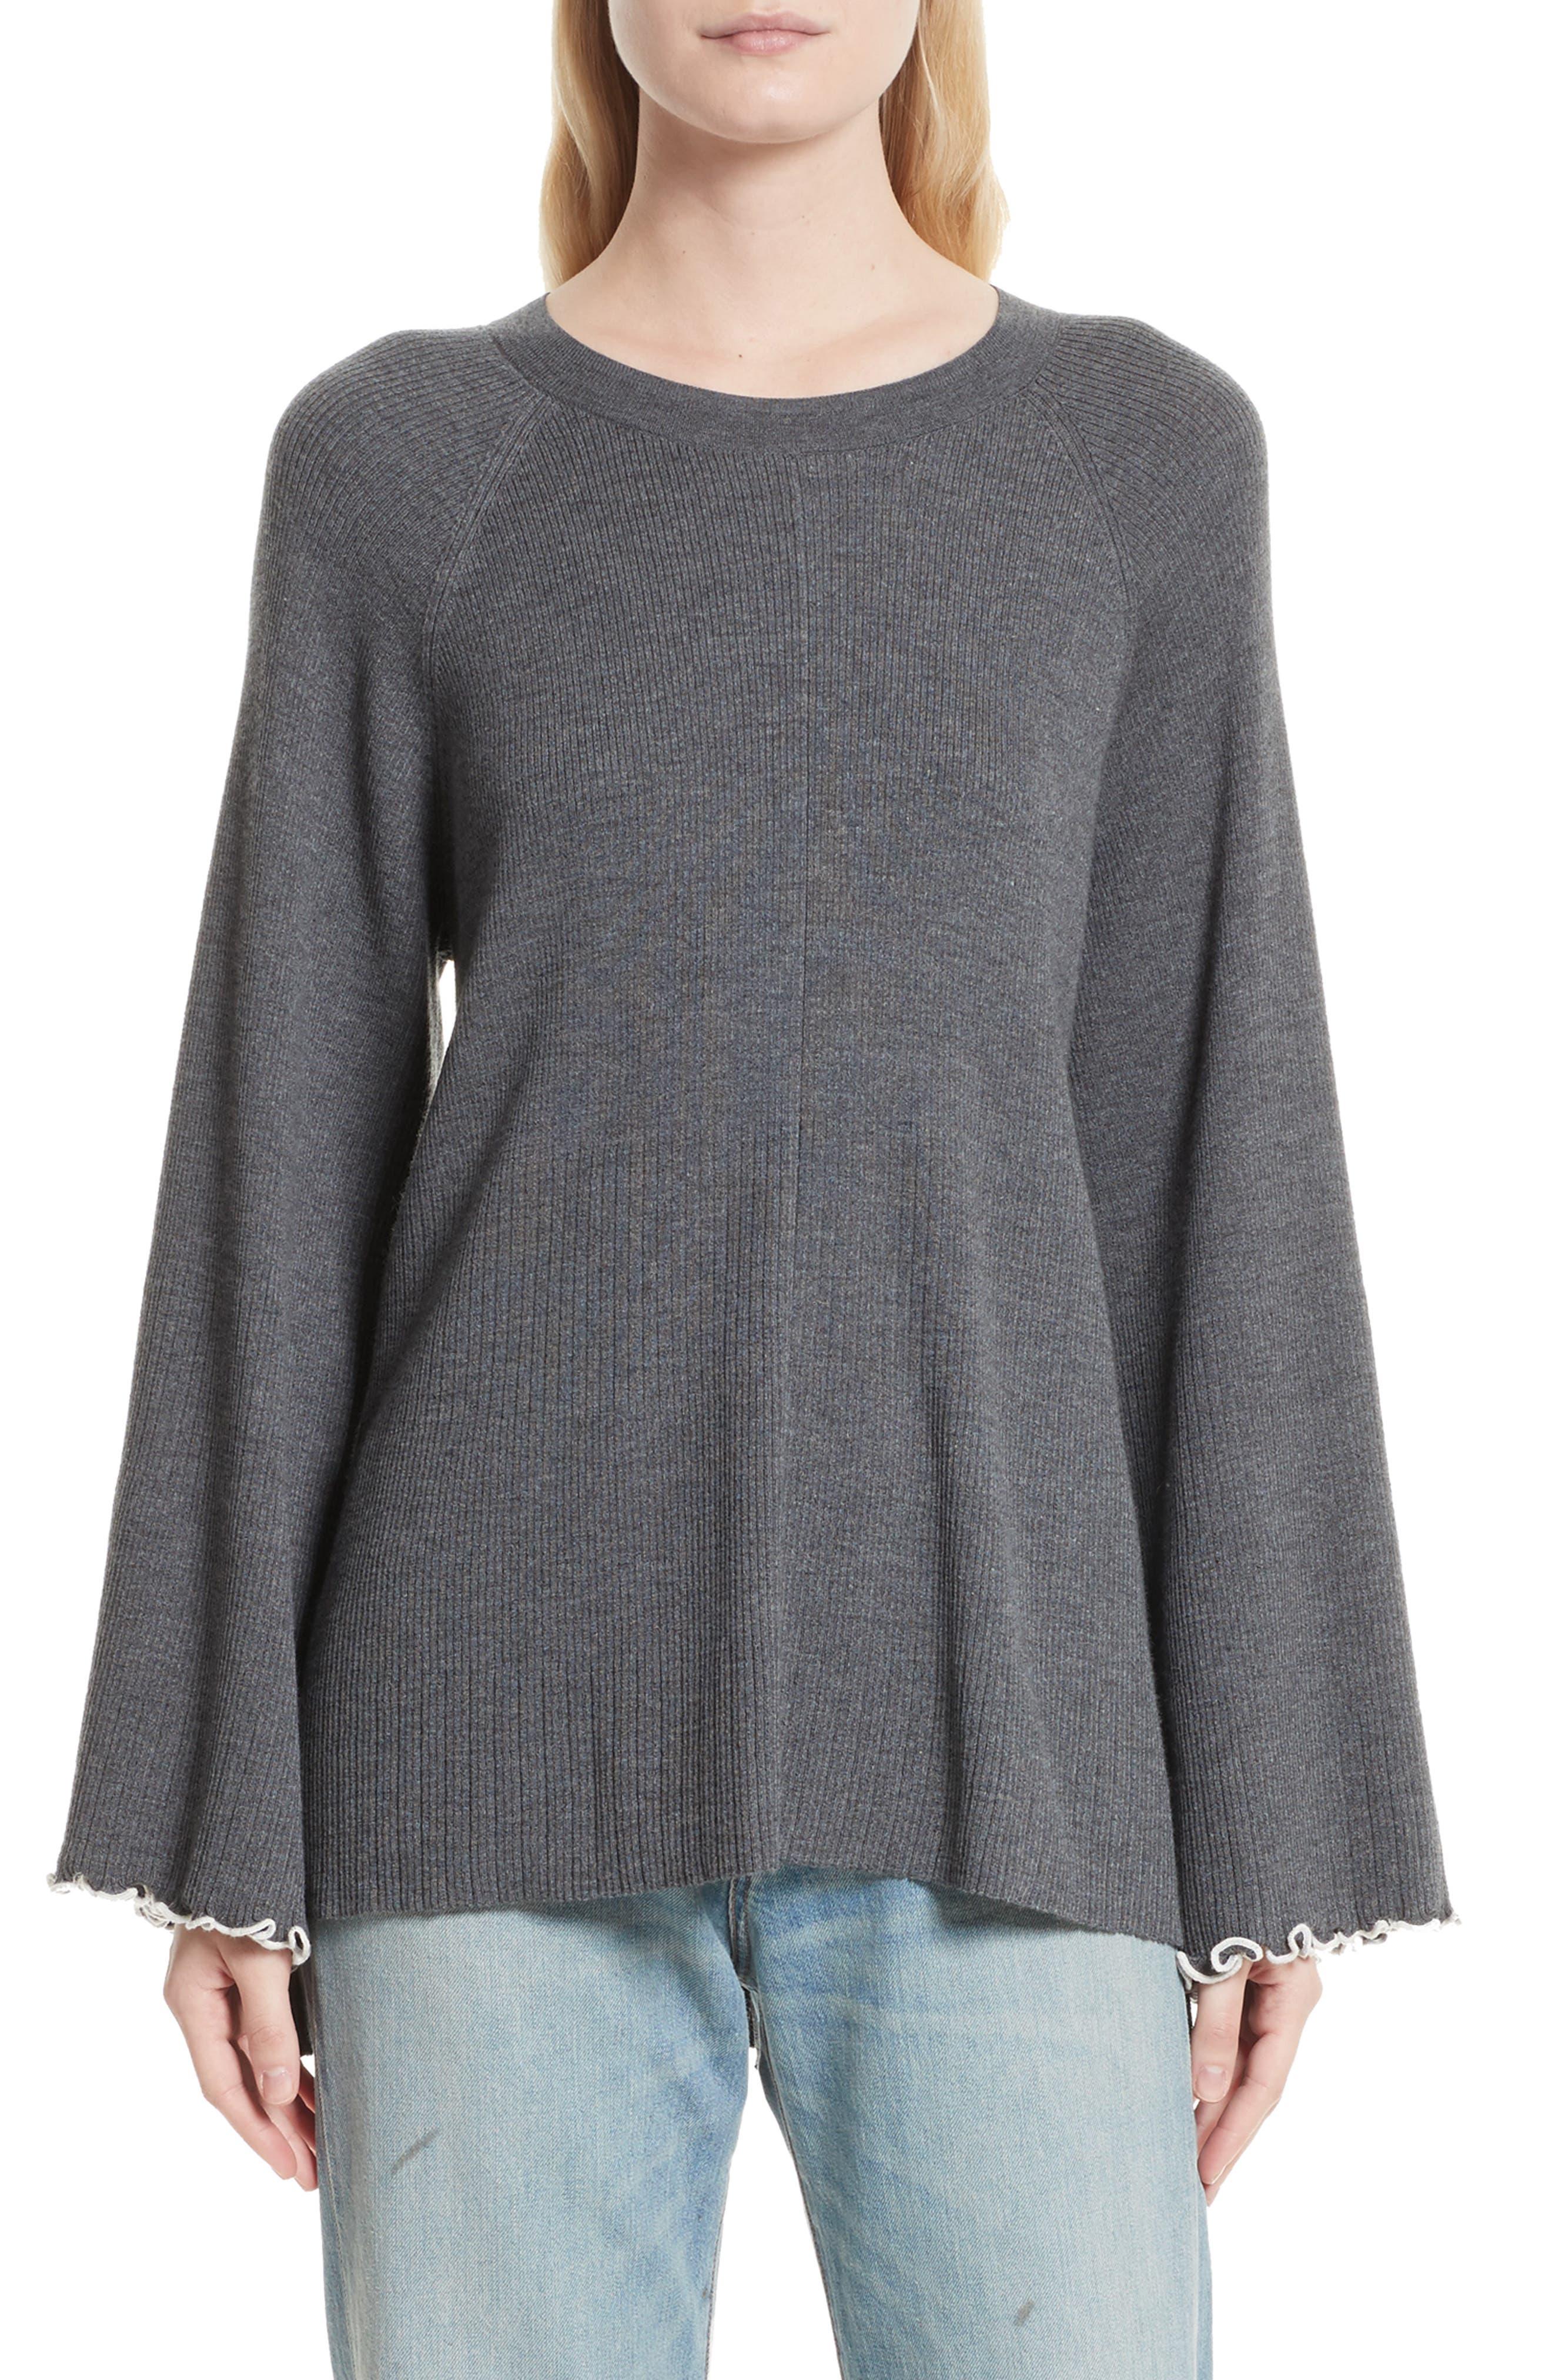 Georgine Merino Wool Blend Sweater,                         Main,                         color, Dark Heather Grey/ Alabaster